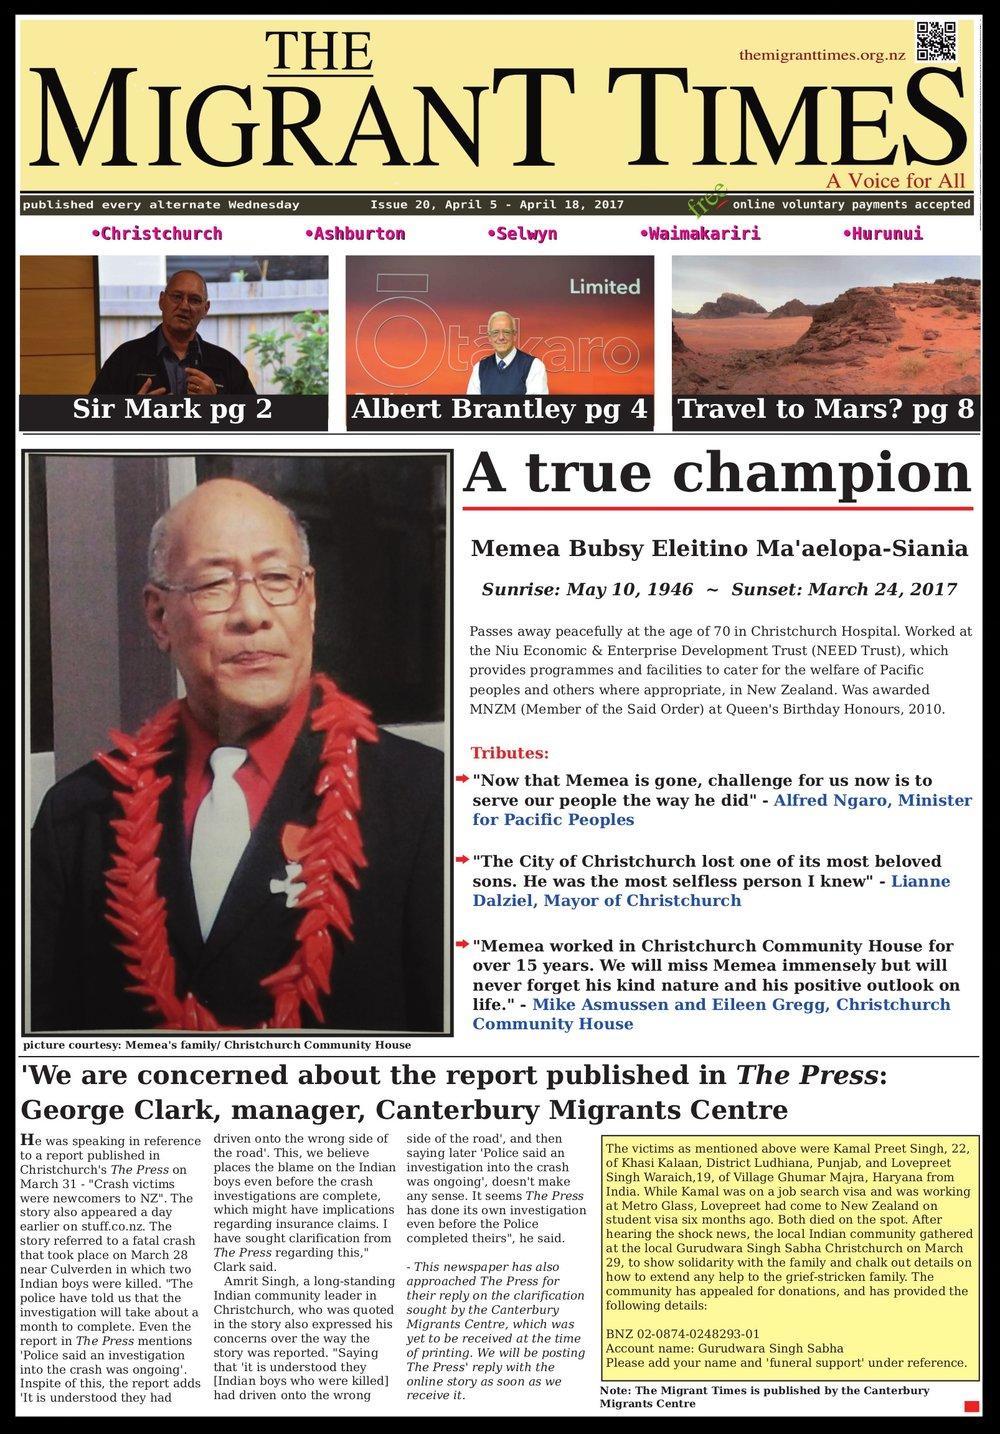 Issue 20, April 5 - April 18, 2017